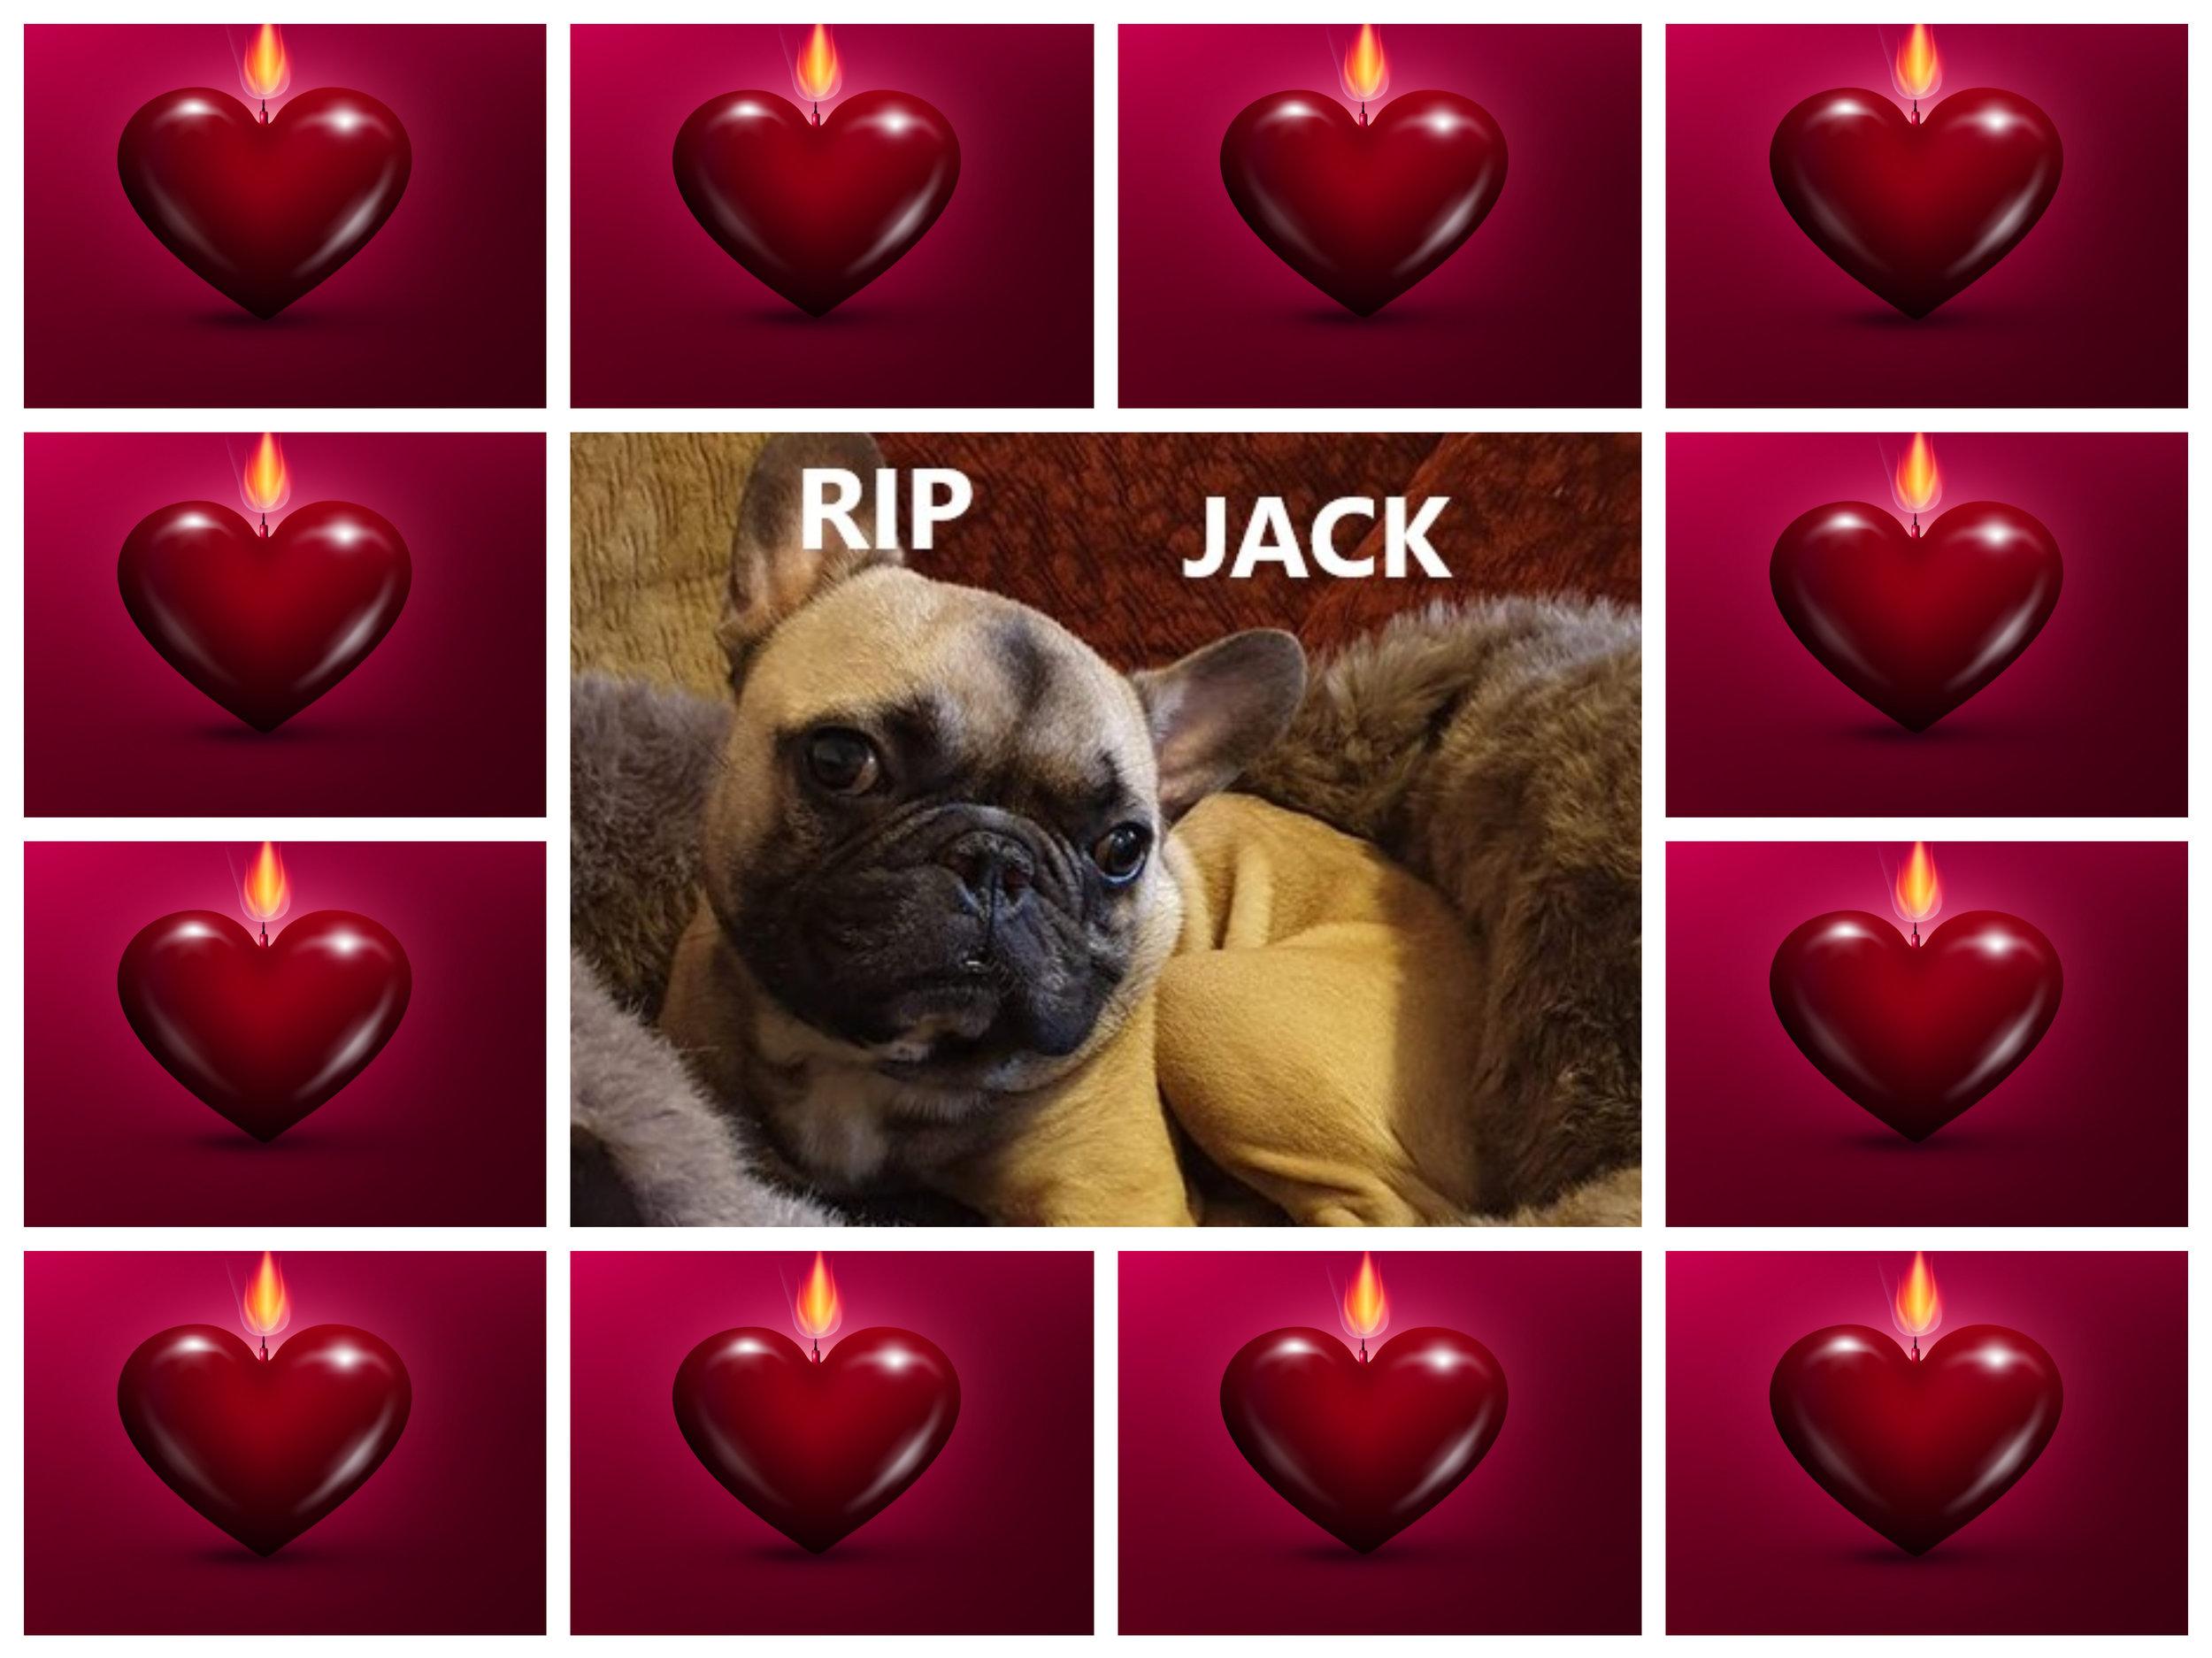 RIP JACK.jpg